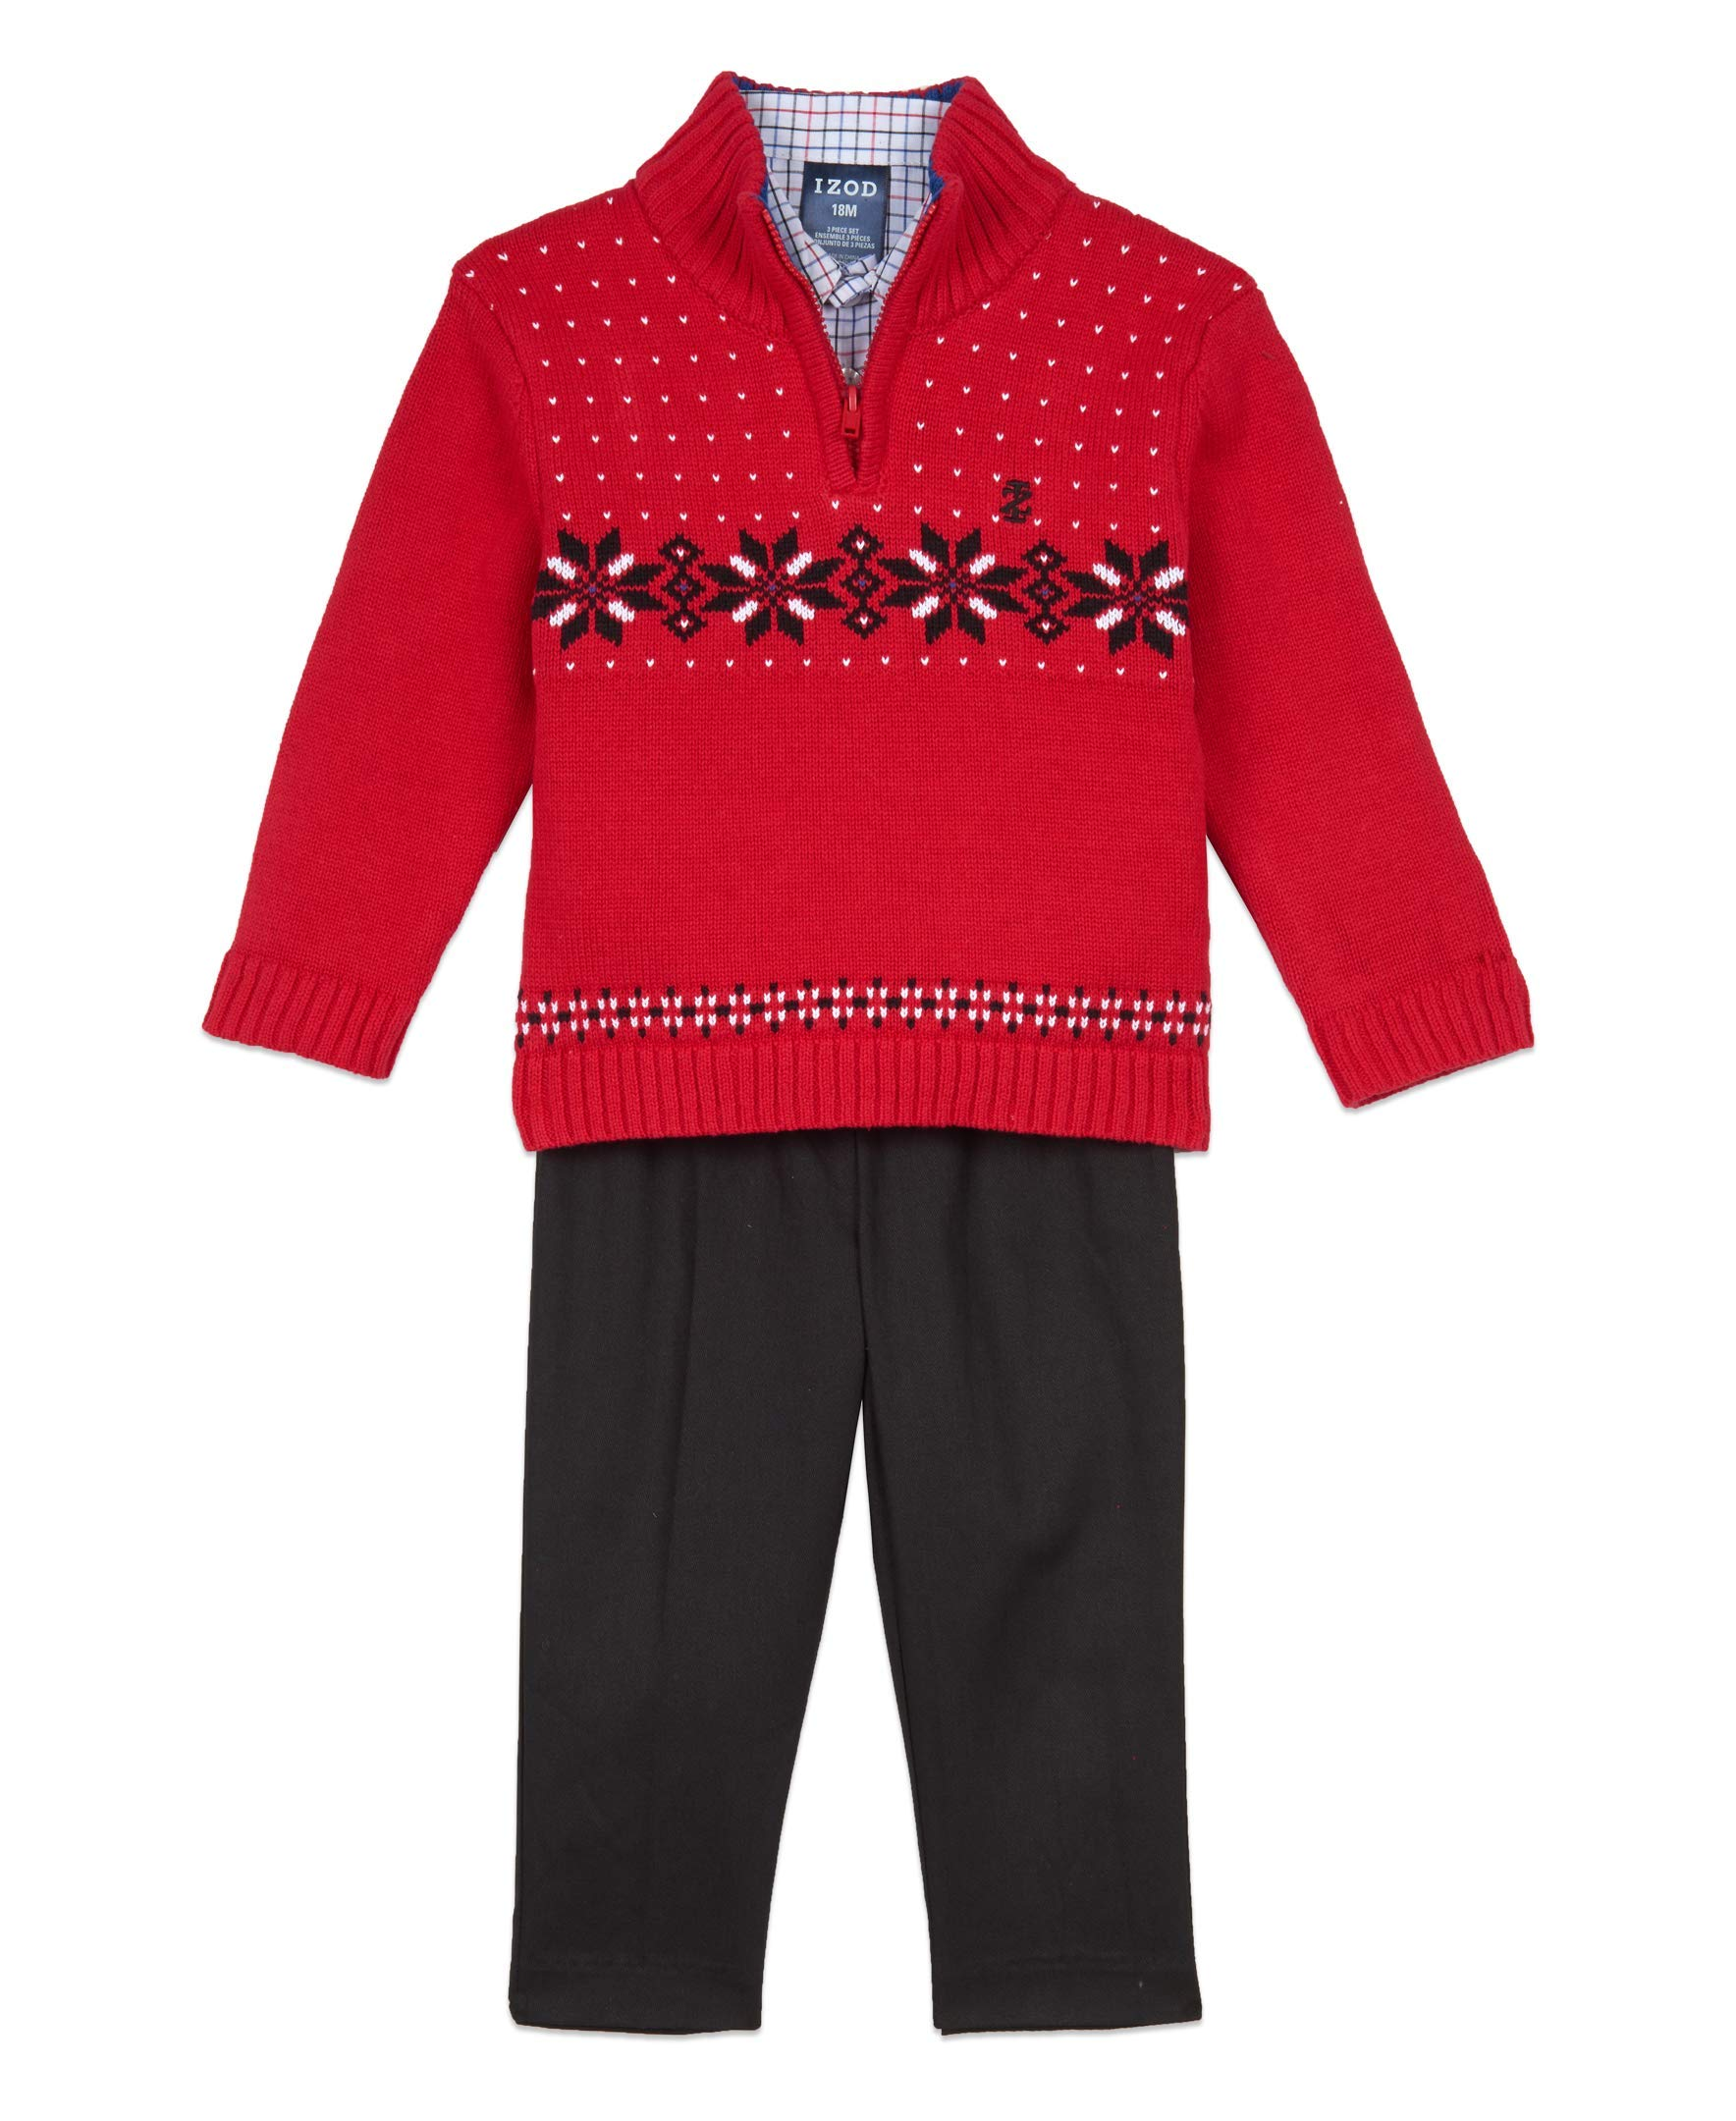 Izod Baby Boys 3-Piece Sweater, Dress Shirt, and Pants Set